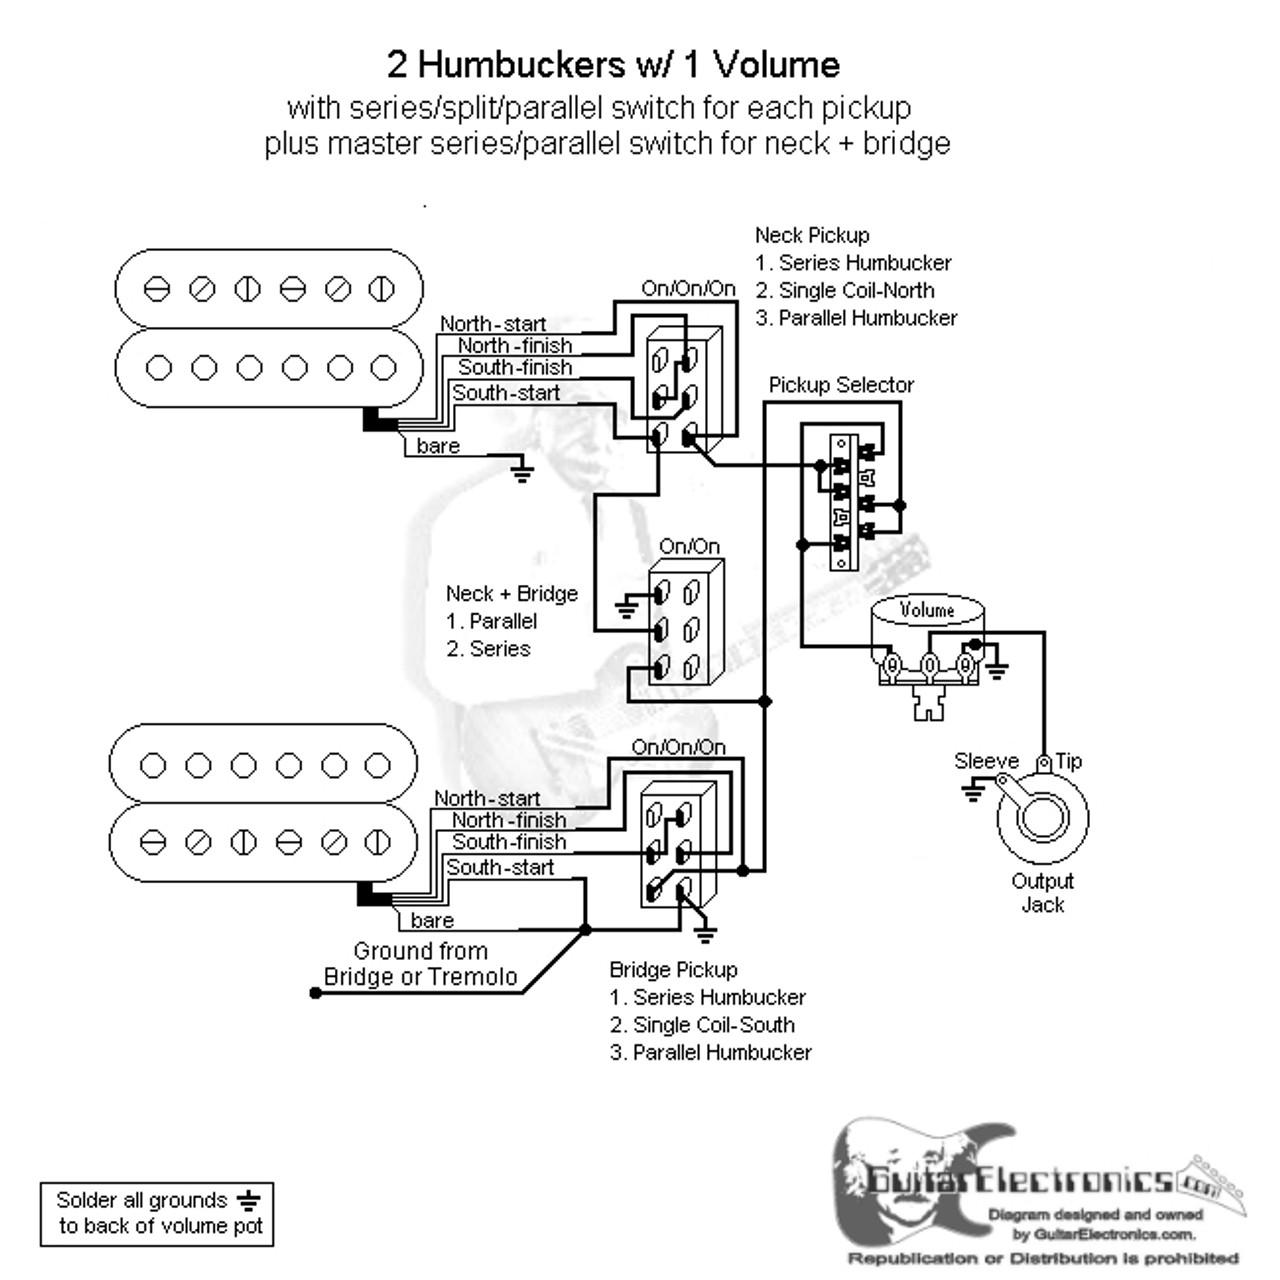 2 hbs 3 way lever 1 vol series split parallel \u0026 master series parallelToggle Switch 1 Volume Seriessplitparallel Master Seriesparallel #7